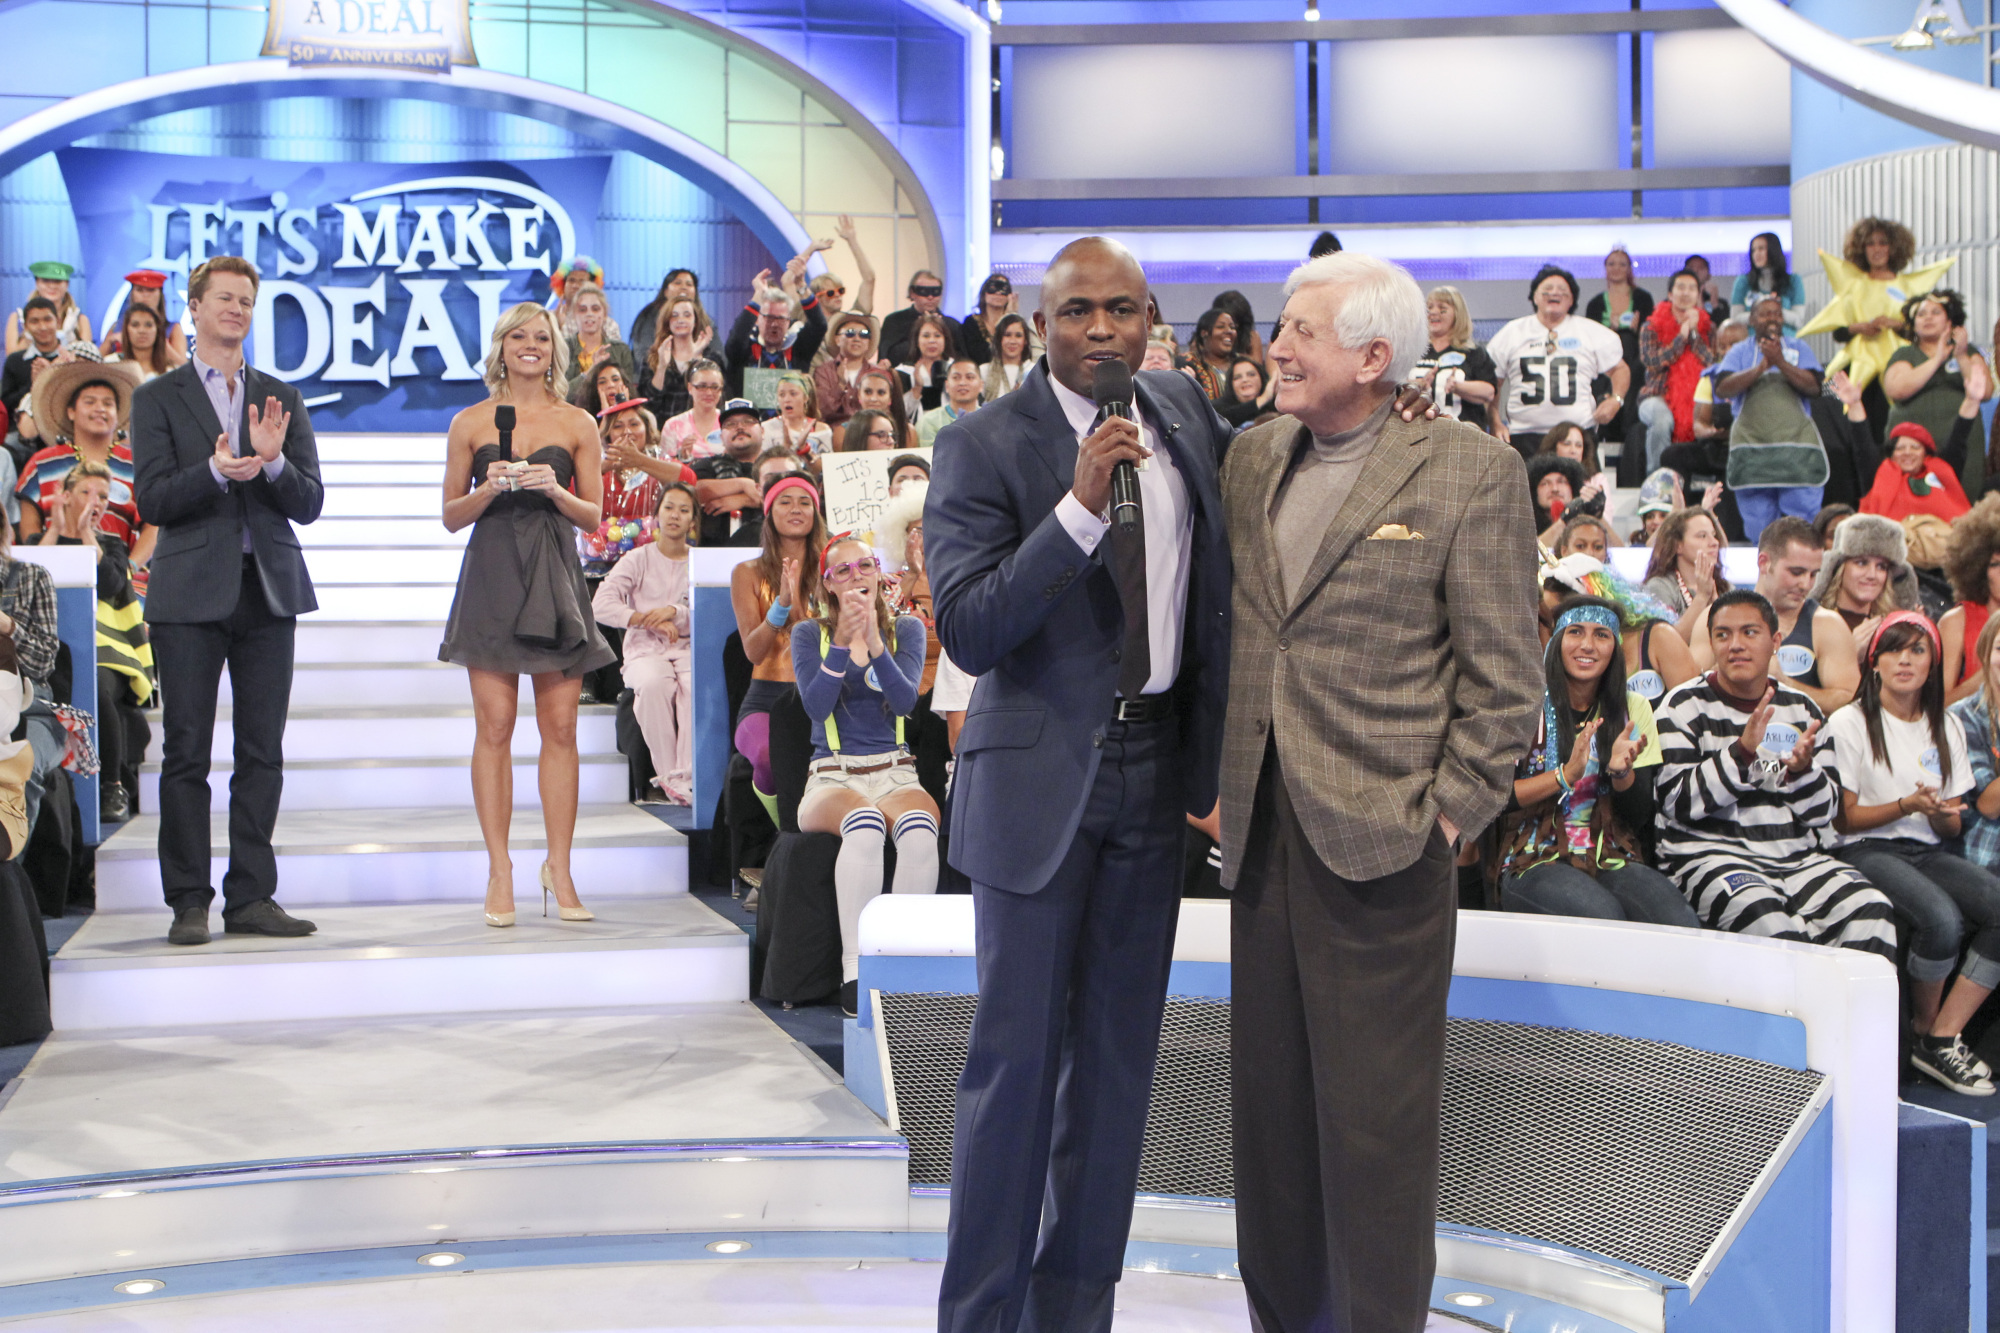 Wayne and Monty